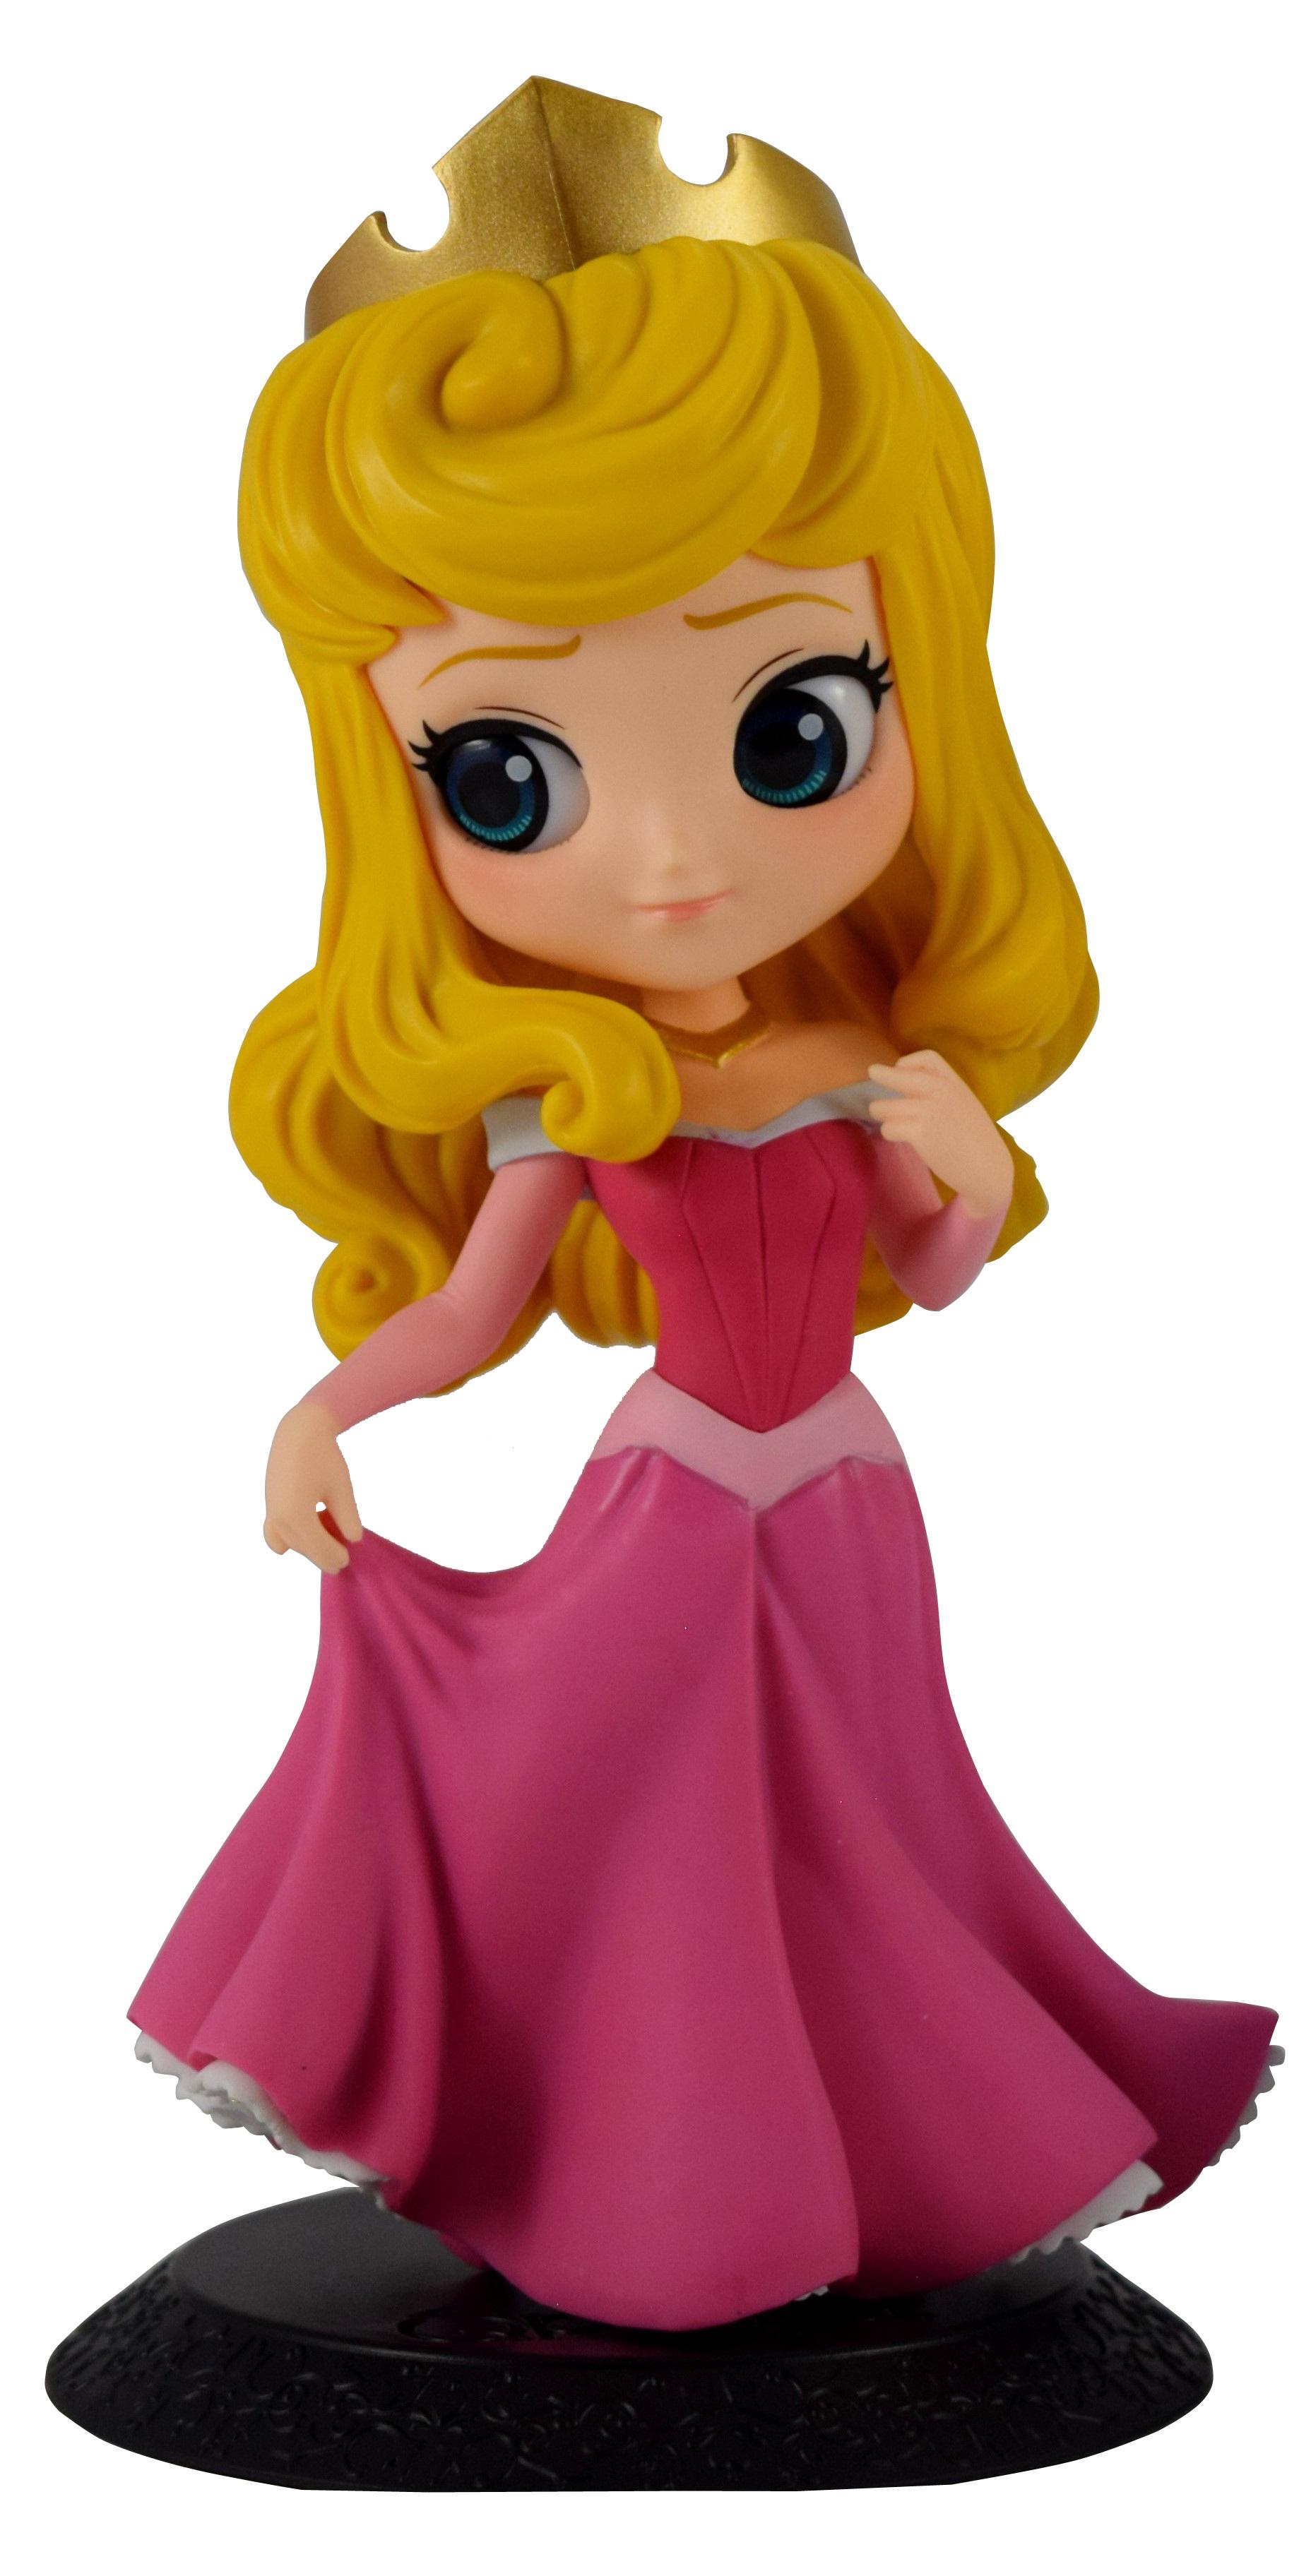 Фигурка Q Posket Disney Character: Sleeping Beauty – Princess Aurora A Pink Dress